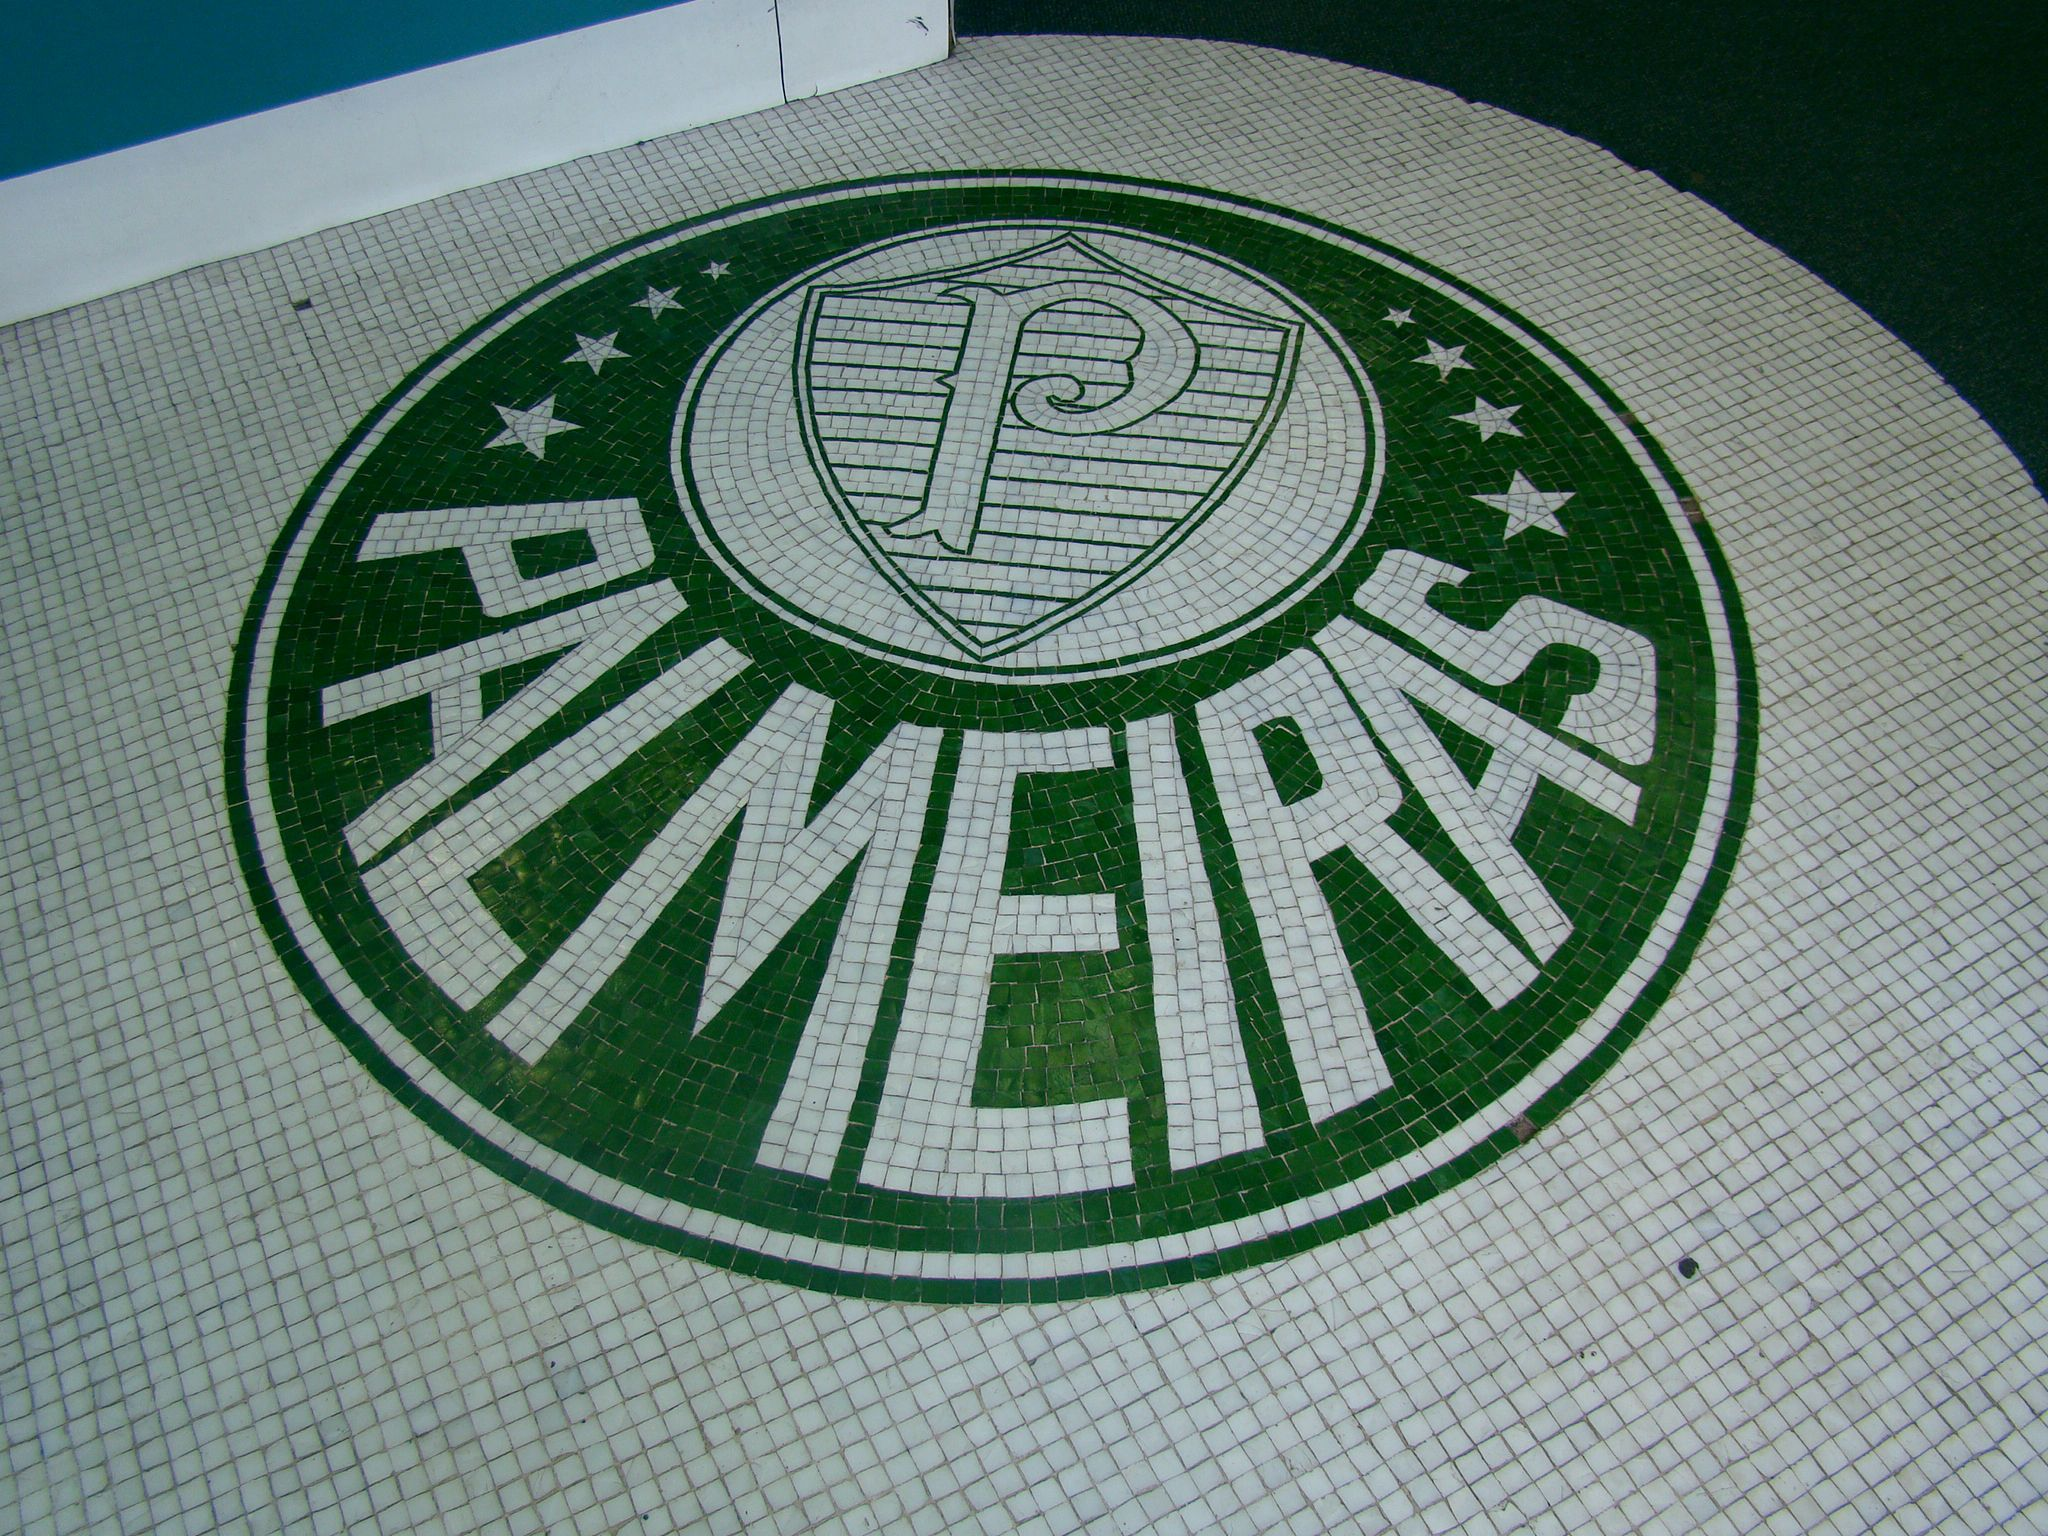 Mosaico simbolo do Palmeiras pastilhas de vidro da Vitrus